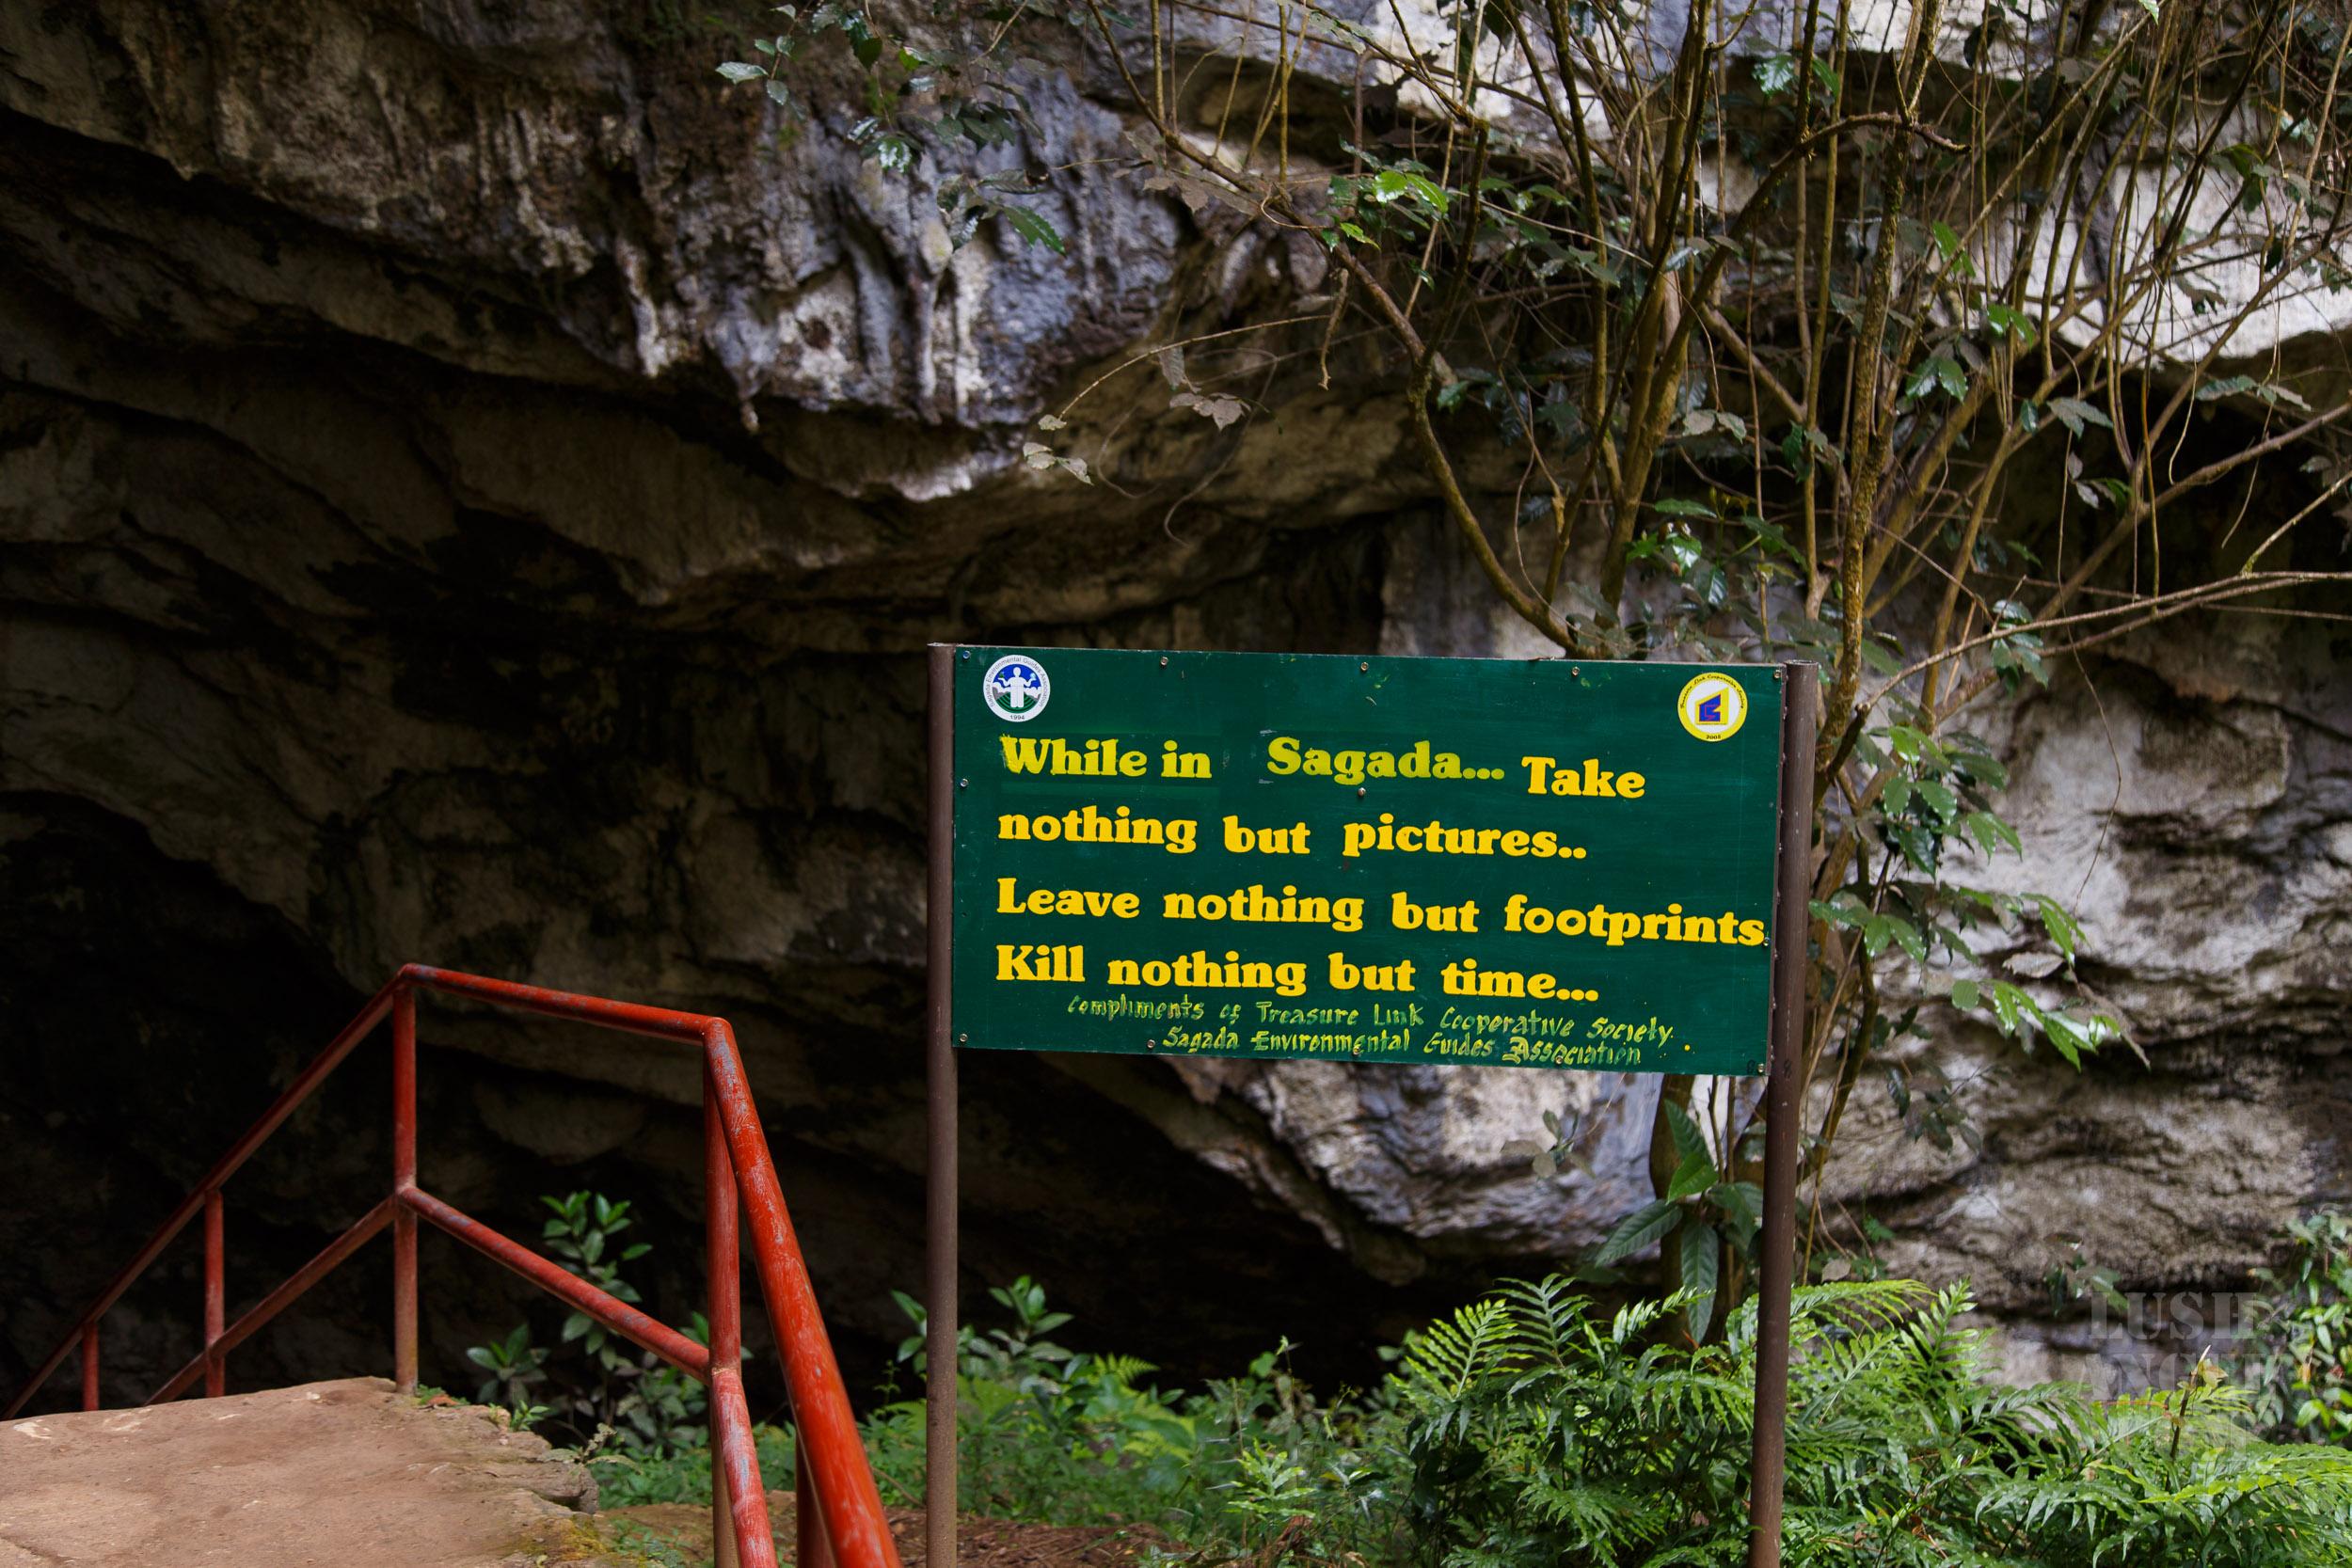 sagada-cave-connection-tour